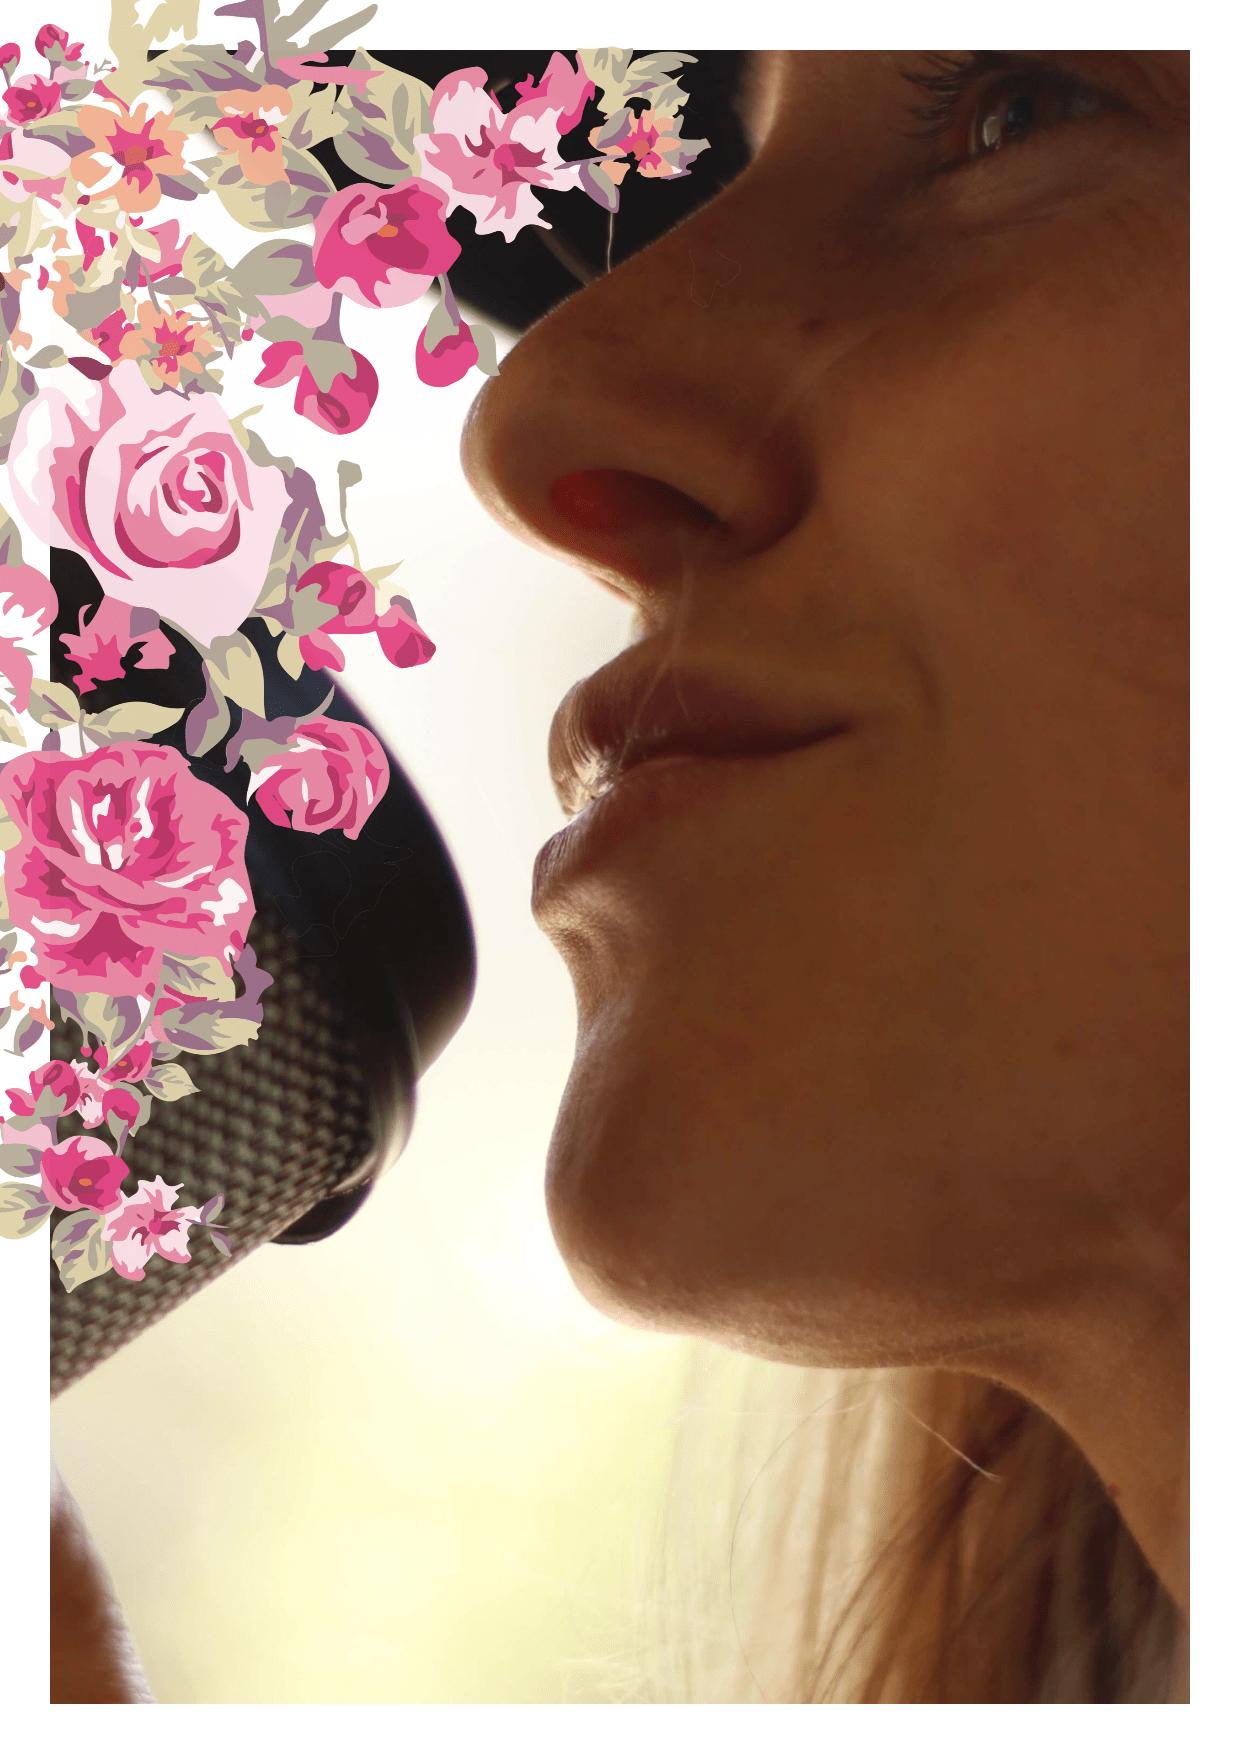 Face,                Nose,                Woman,                Beauty,                Head,                Image,                Avatar,                White,                Black,                 Free Image